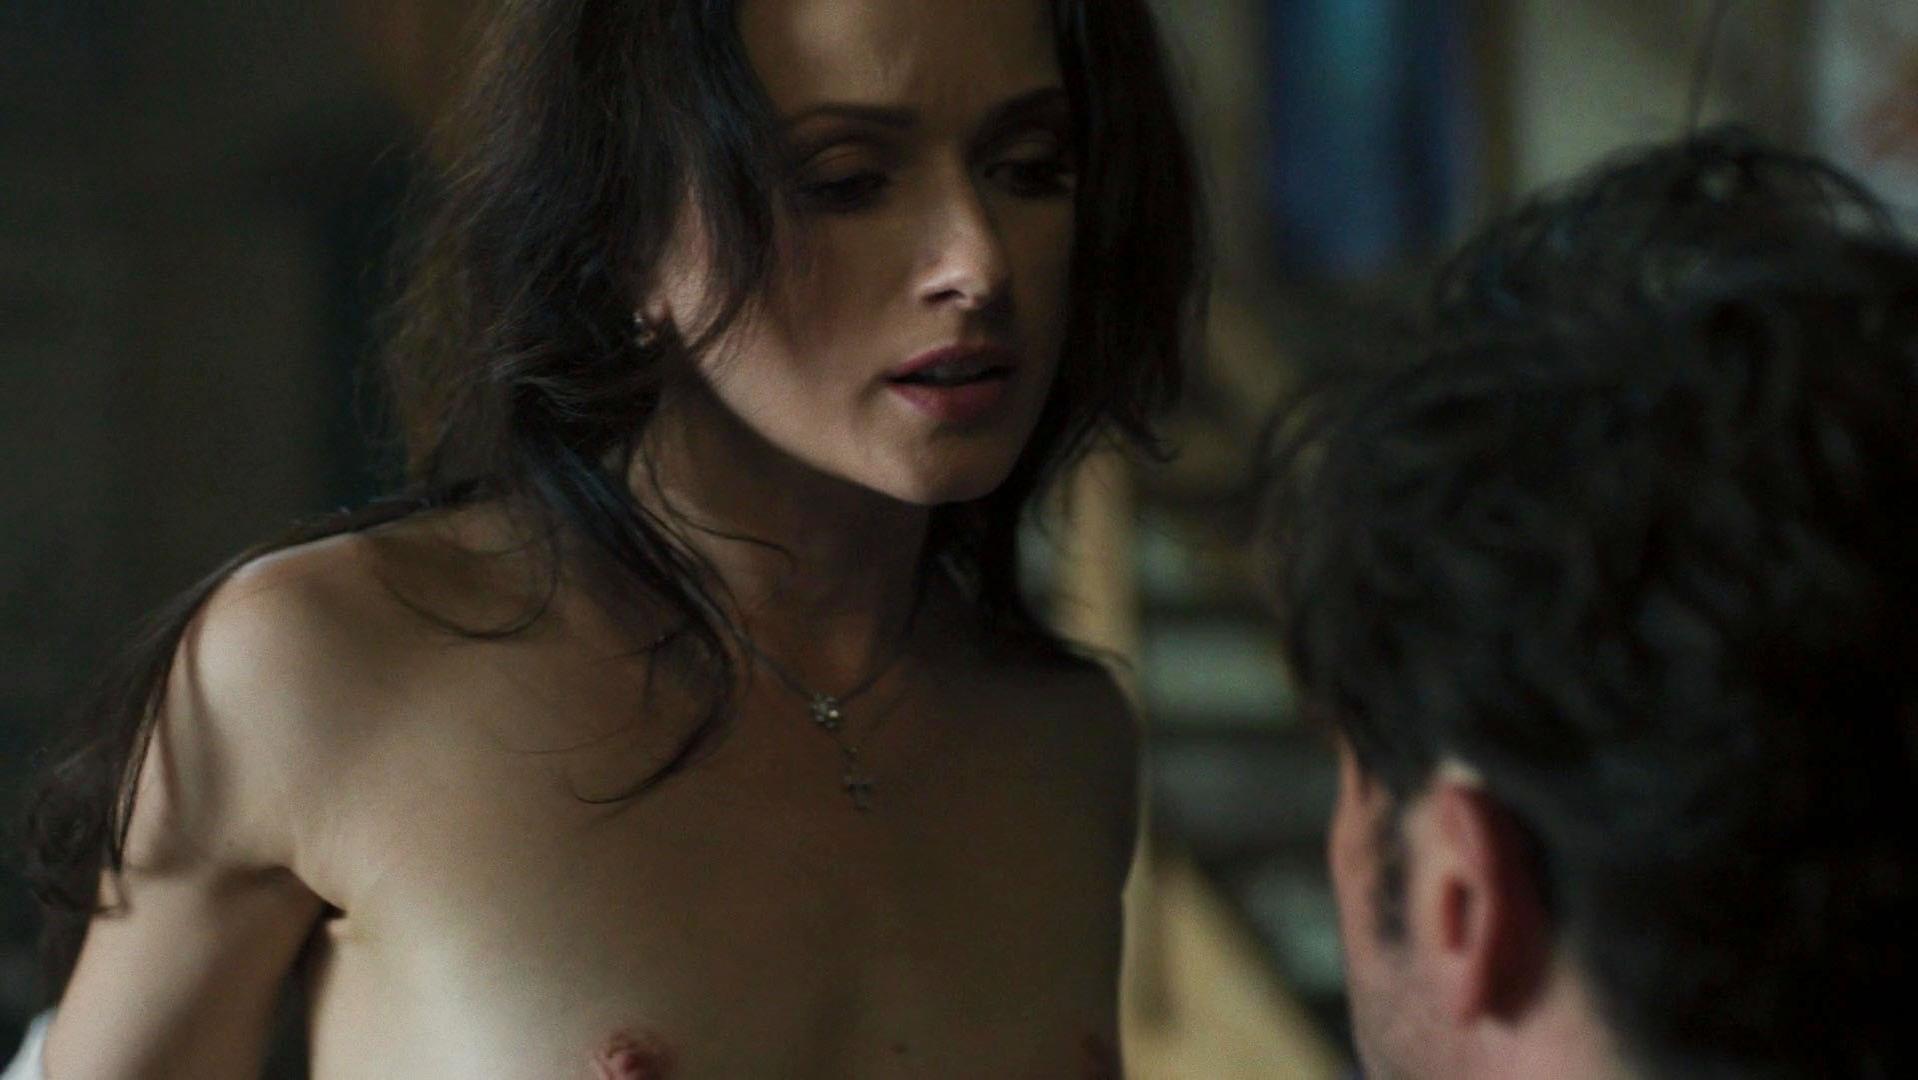 Irina Dvorovenko nude - Flesh and Bone s01e07 (2015)